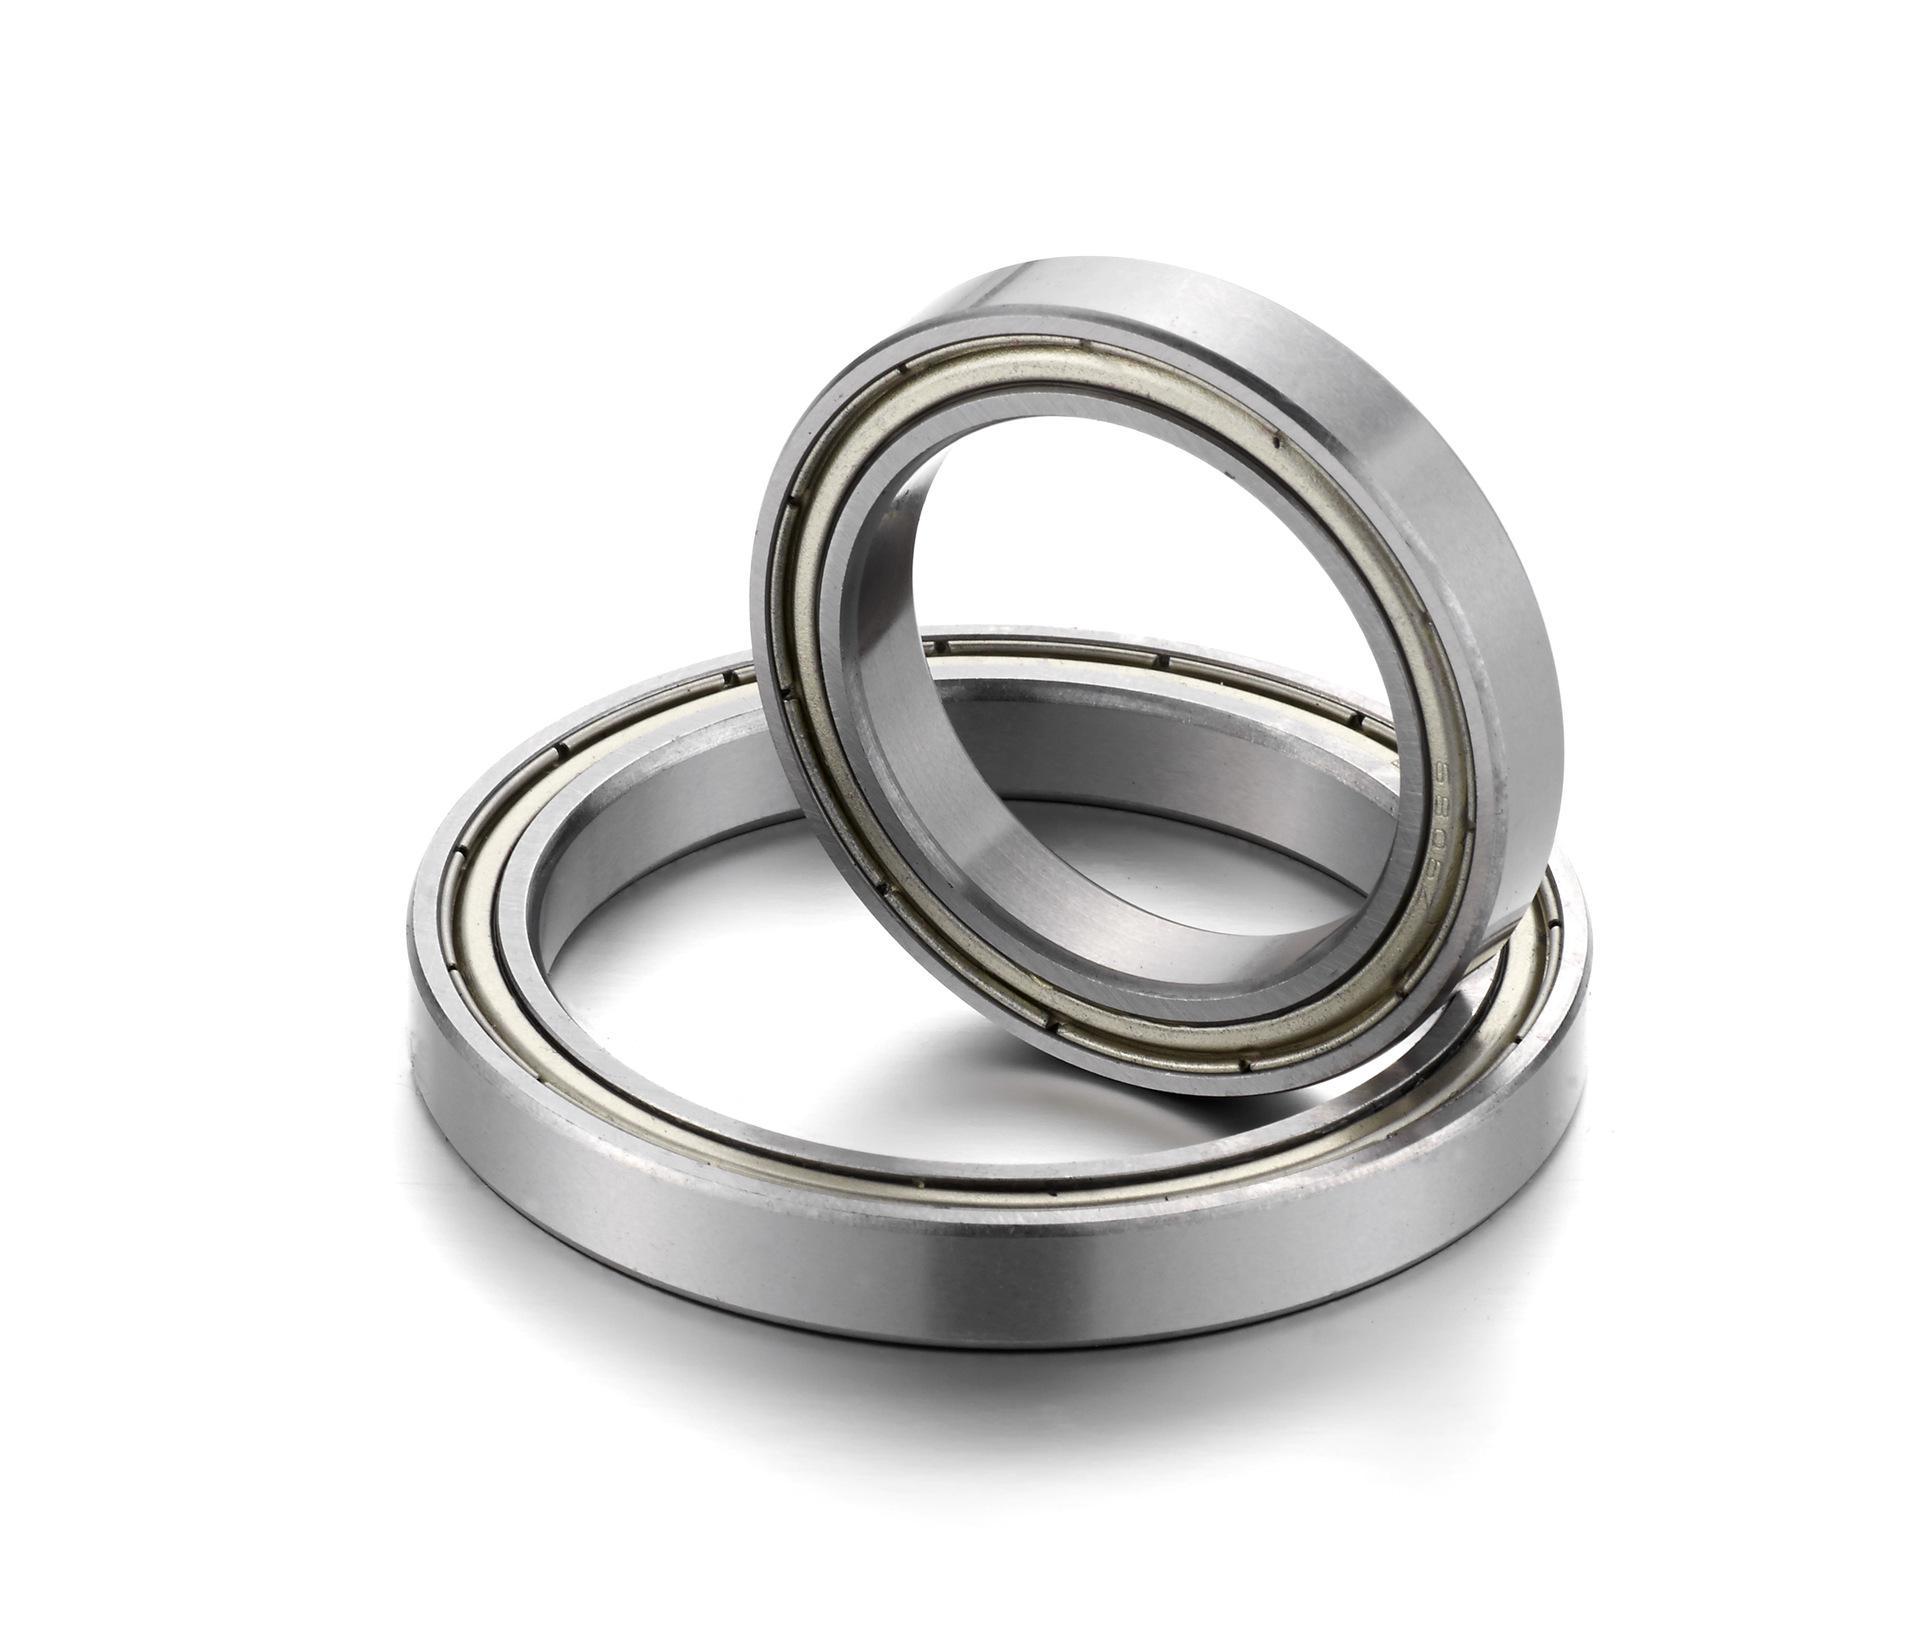 6824M ABEC-1  120x150x16mm Metric Thin Section Bearings brass cage 61824M 1pcs 71822 71822cd p4 7822 110x140x16 mochu thin walled miniature angular contact bearings speed spindle bearings cnc abec 7